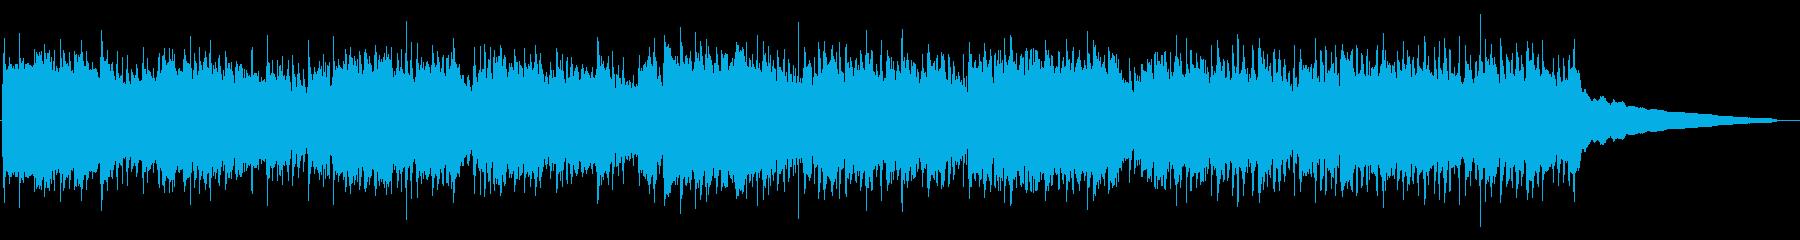 CM・情熱的でかっこいいフラメンコ47秒の再生済みの波形